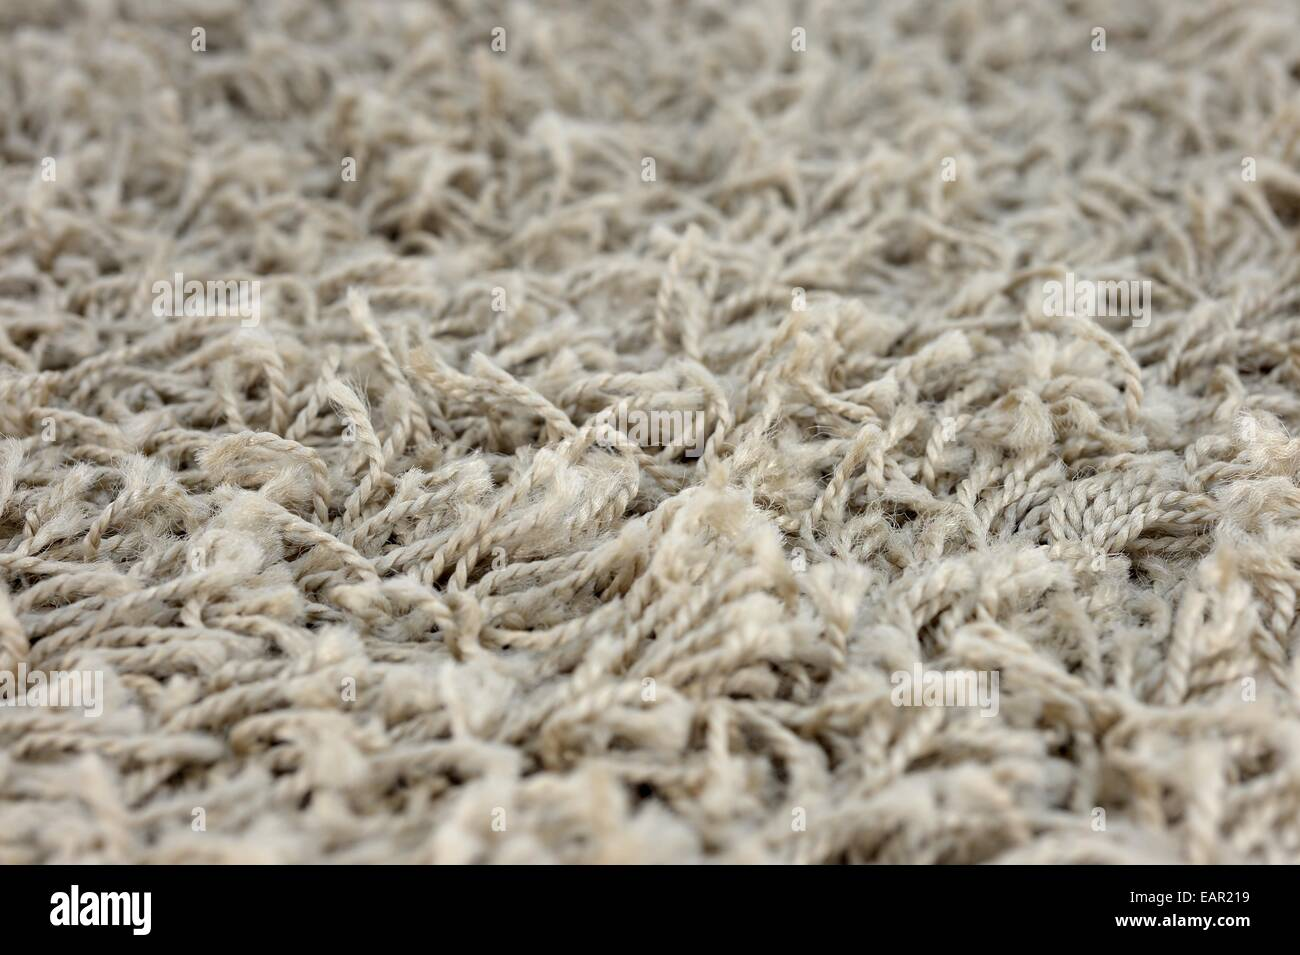 A close up shot of shag carpet - Stock Image